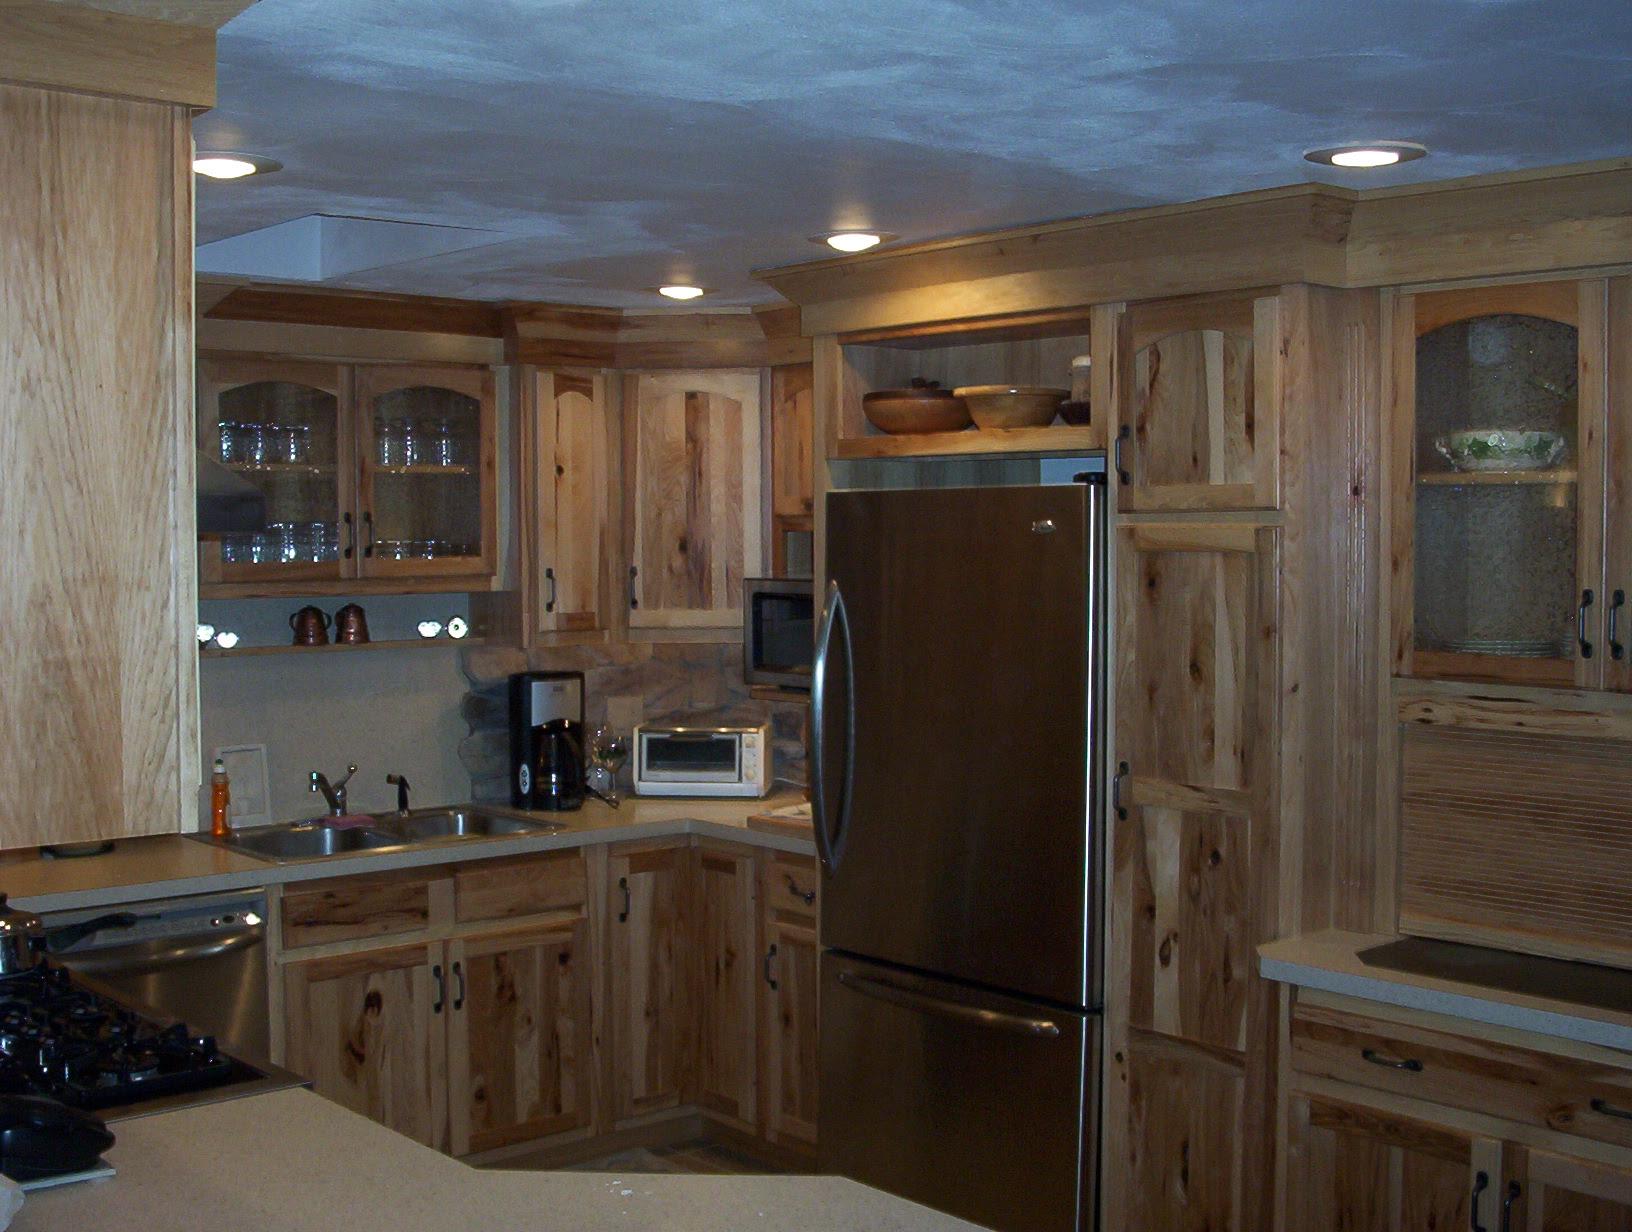 Kitchen Remodeling, Custom Cabinets: Binghamton, Owego, NY ...